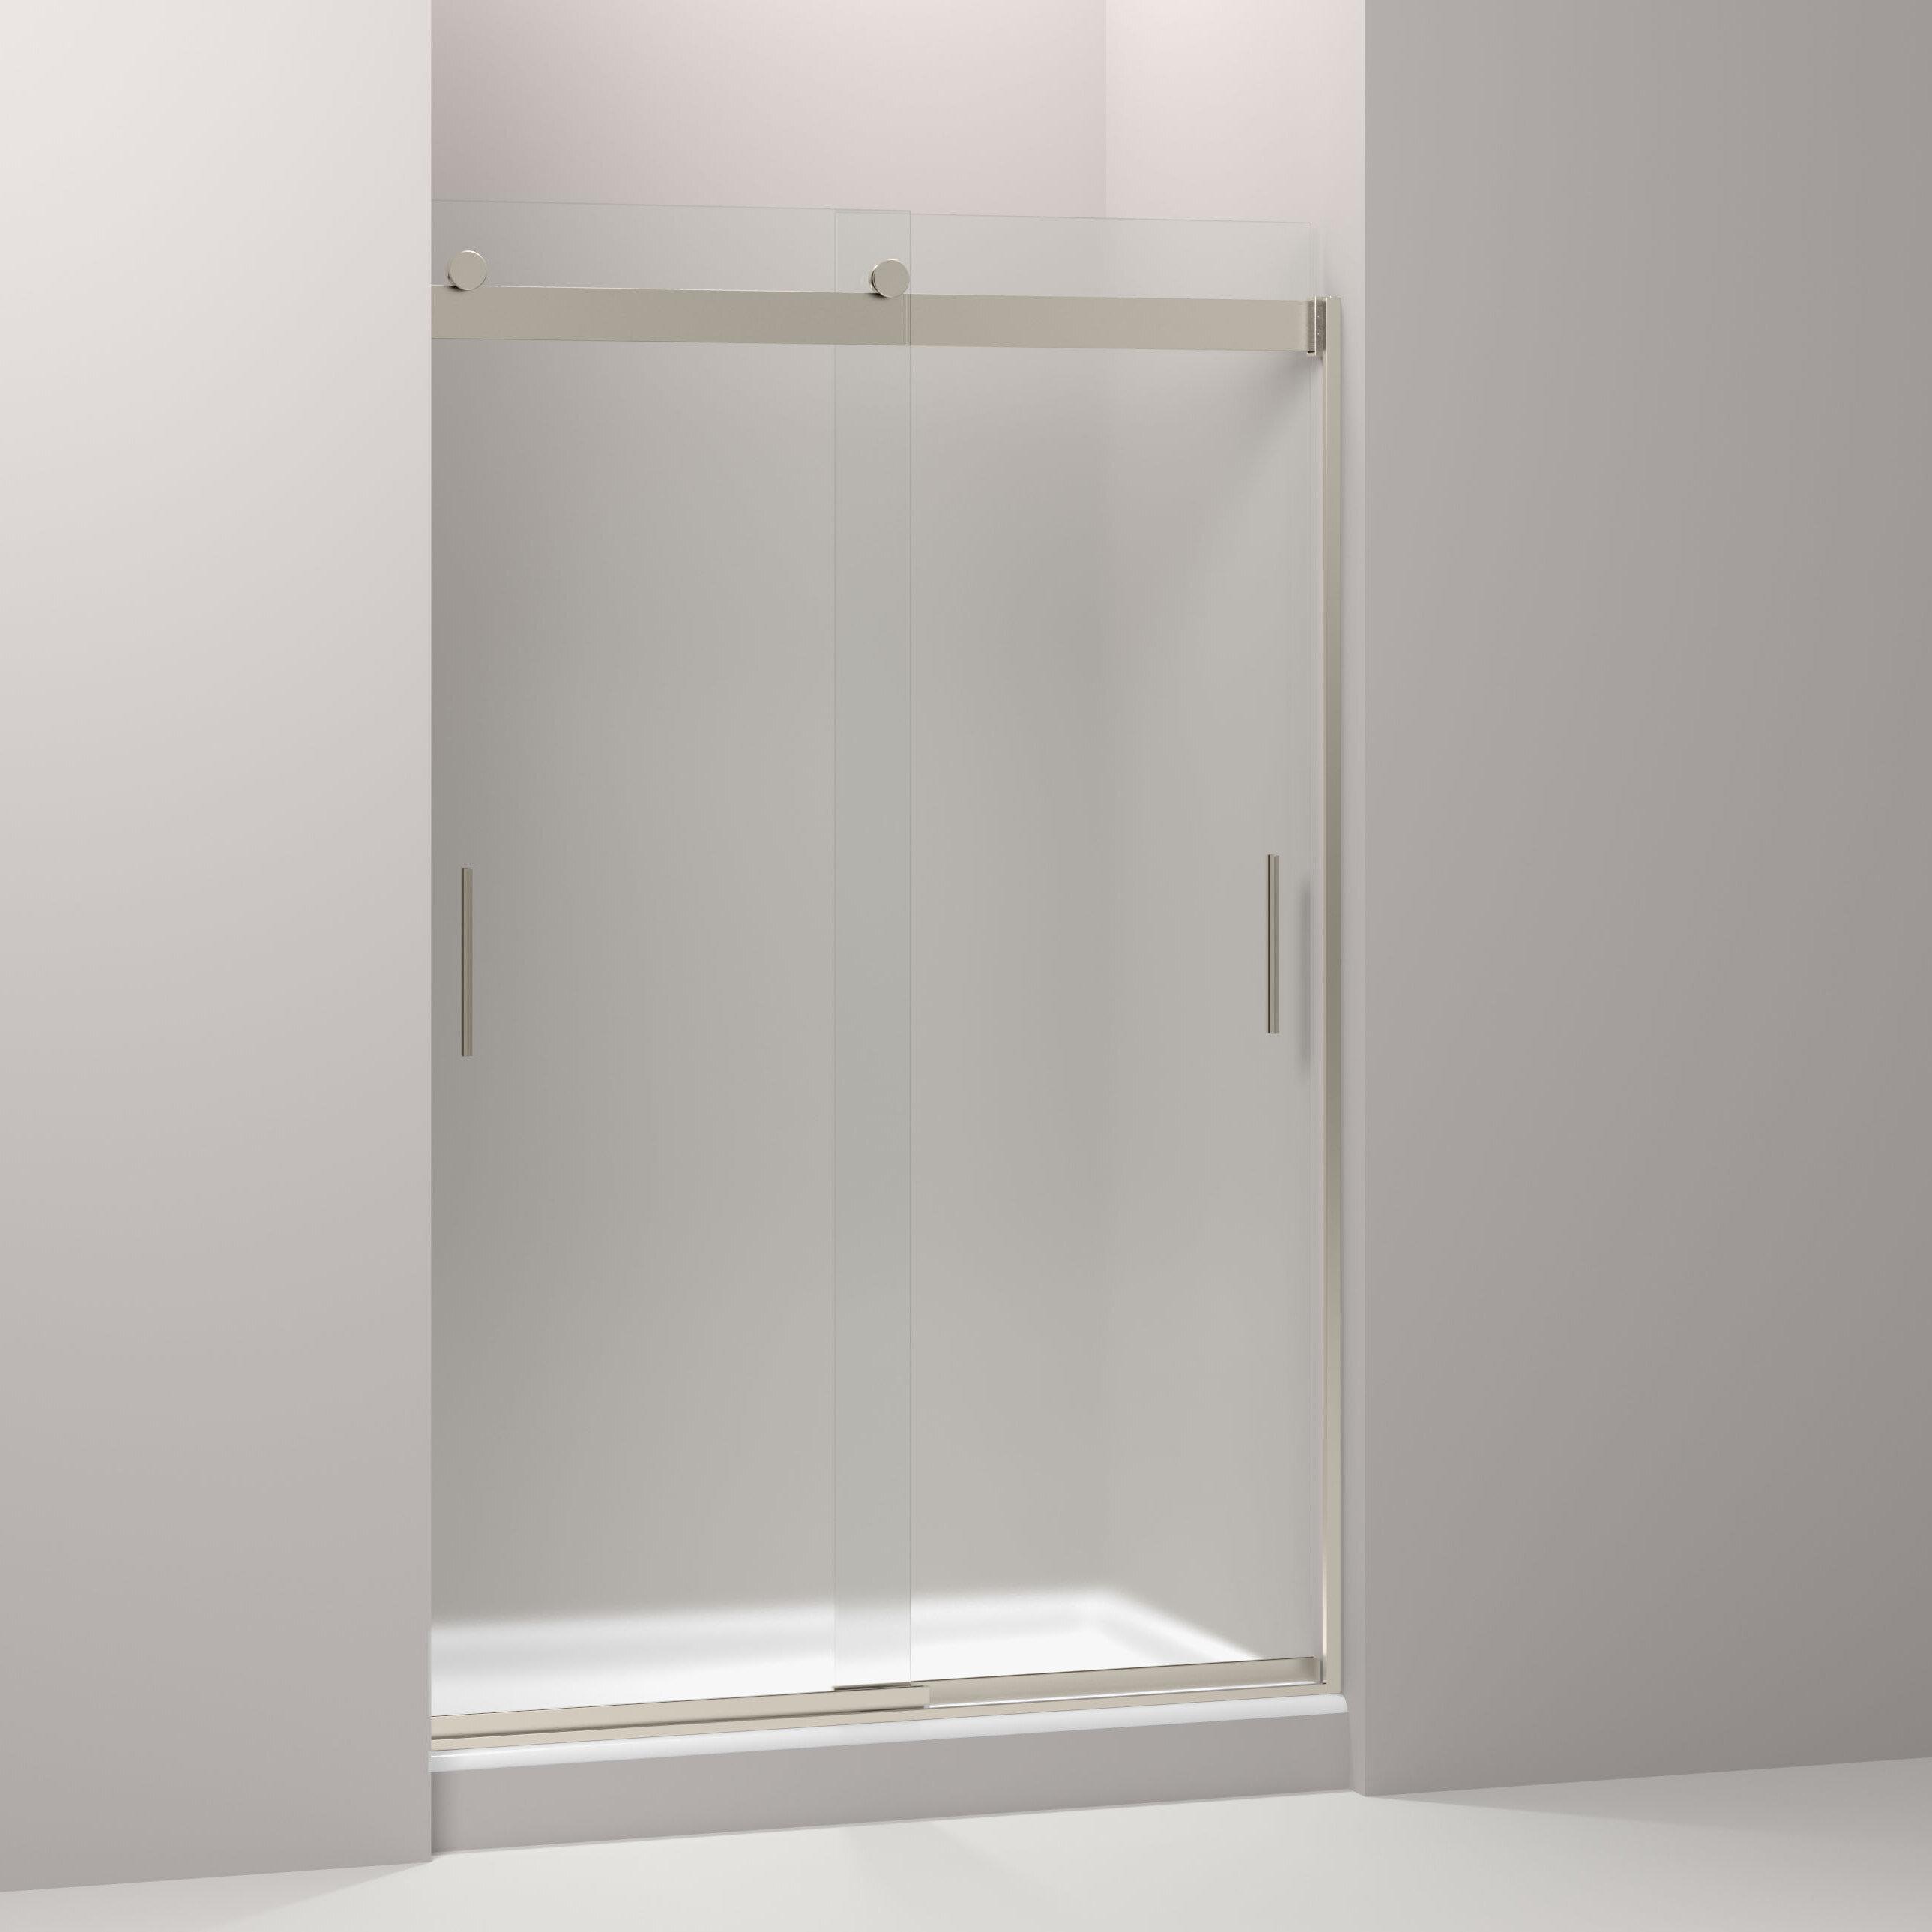 K 706008 D3 Abvmxsh Kohler Levity 4763 X 74 Bypass Shower Door